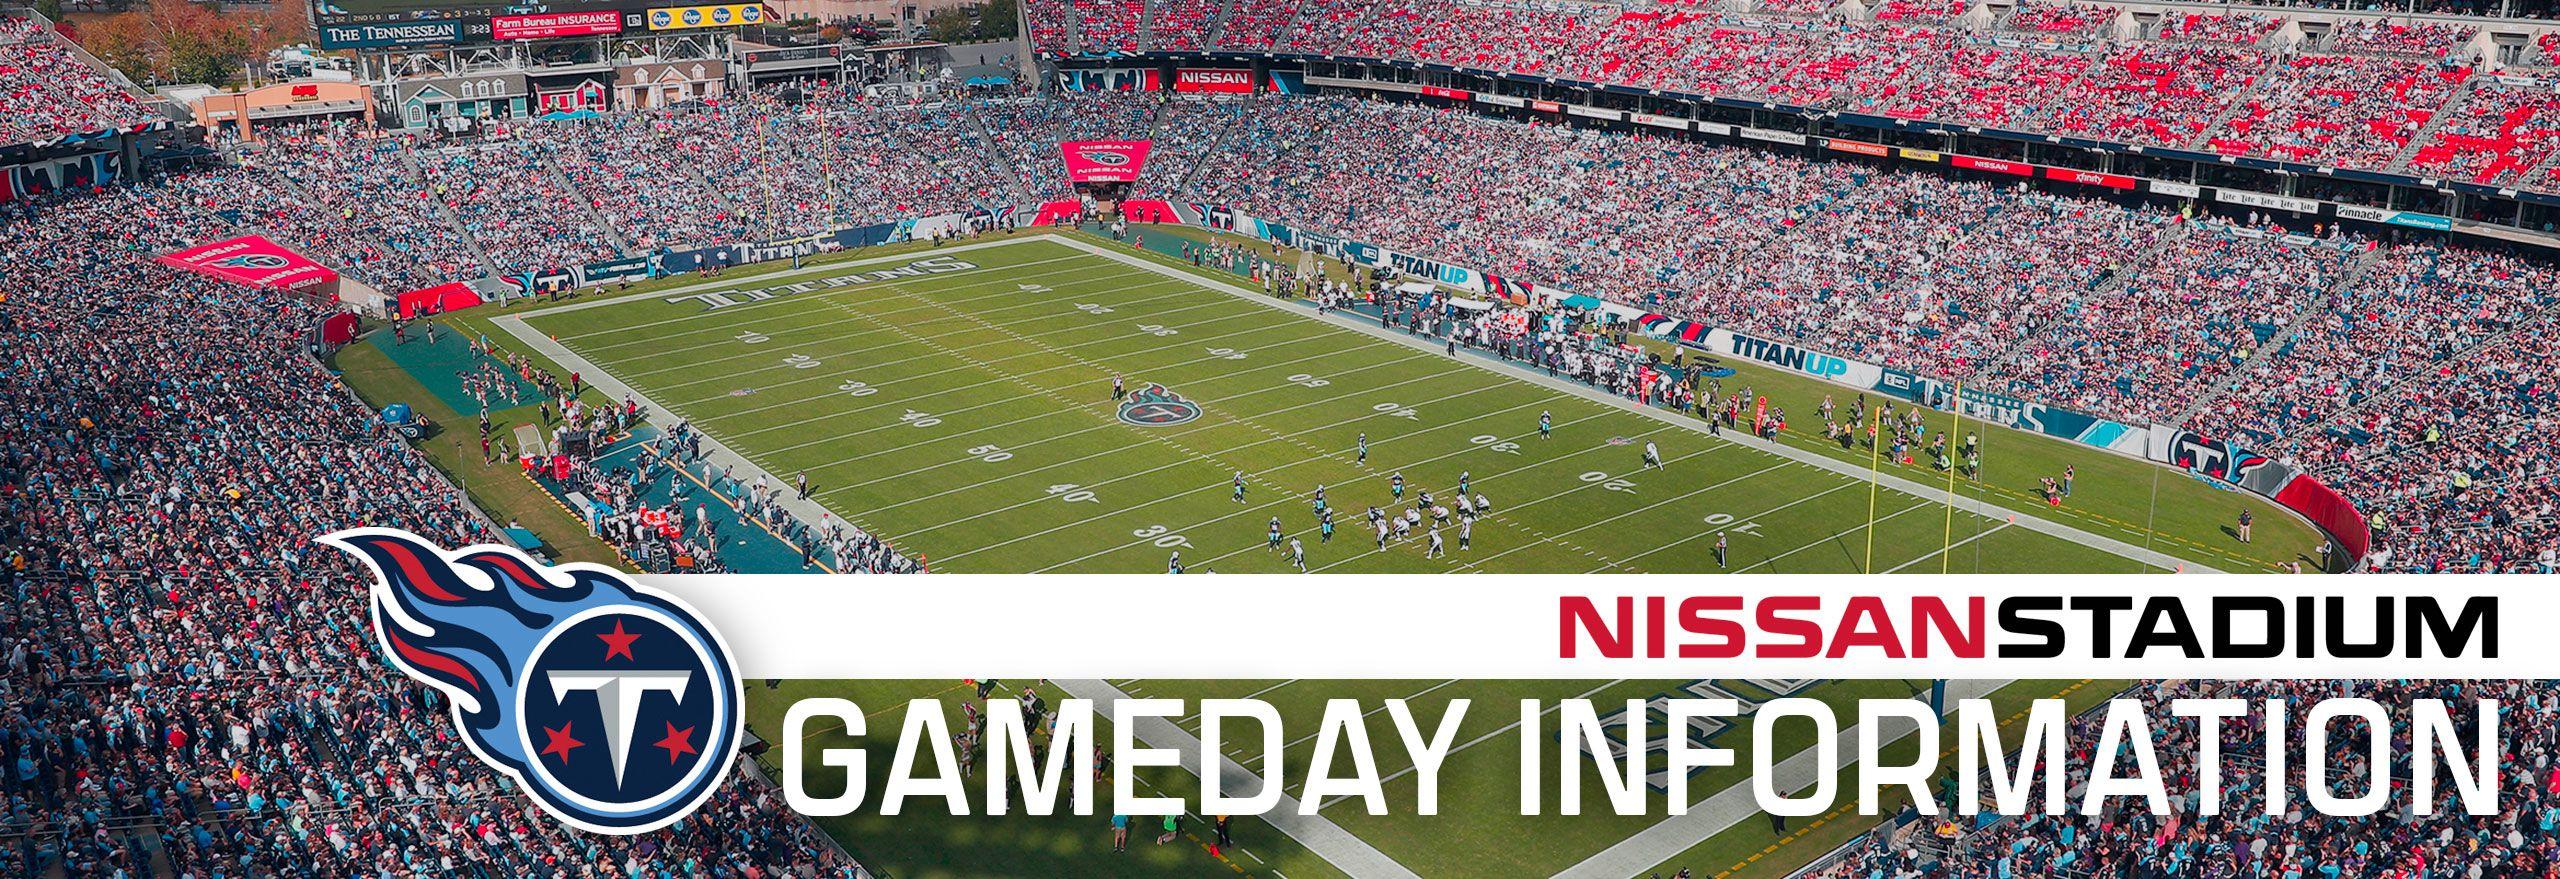 titans-gameday-information-nissan-stadium